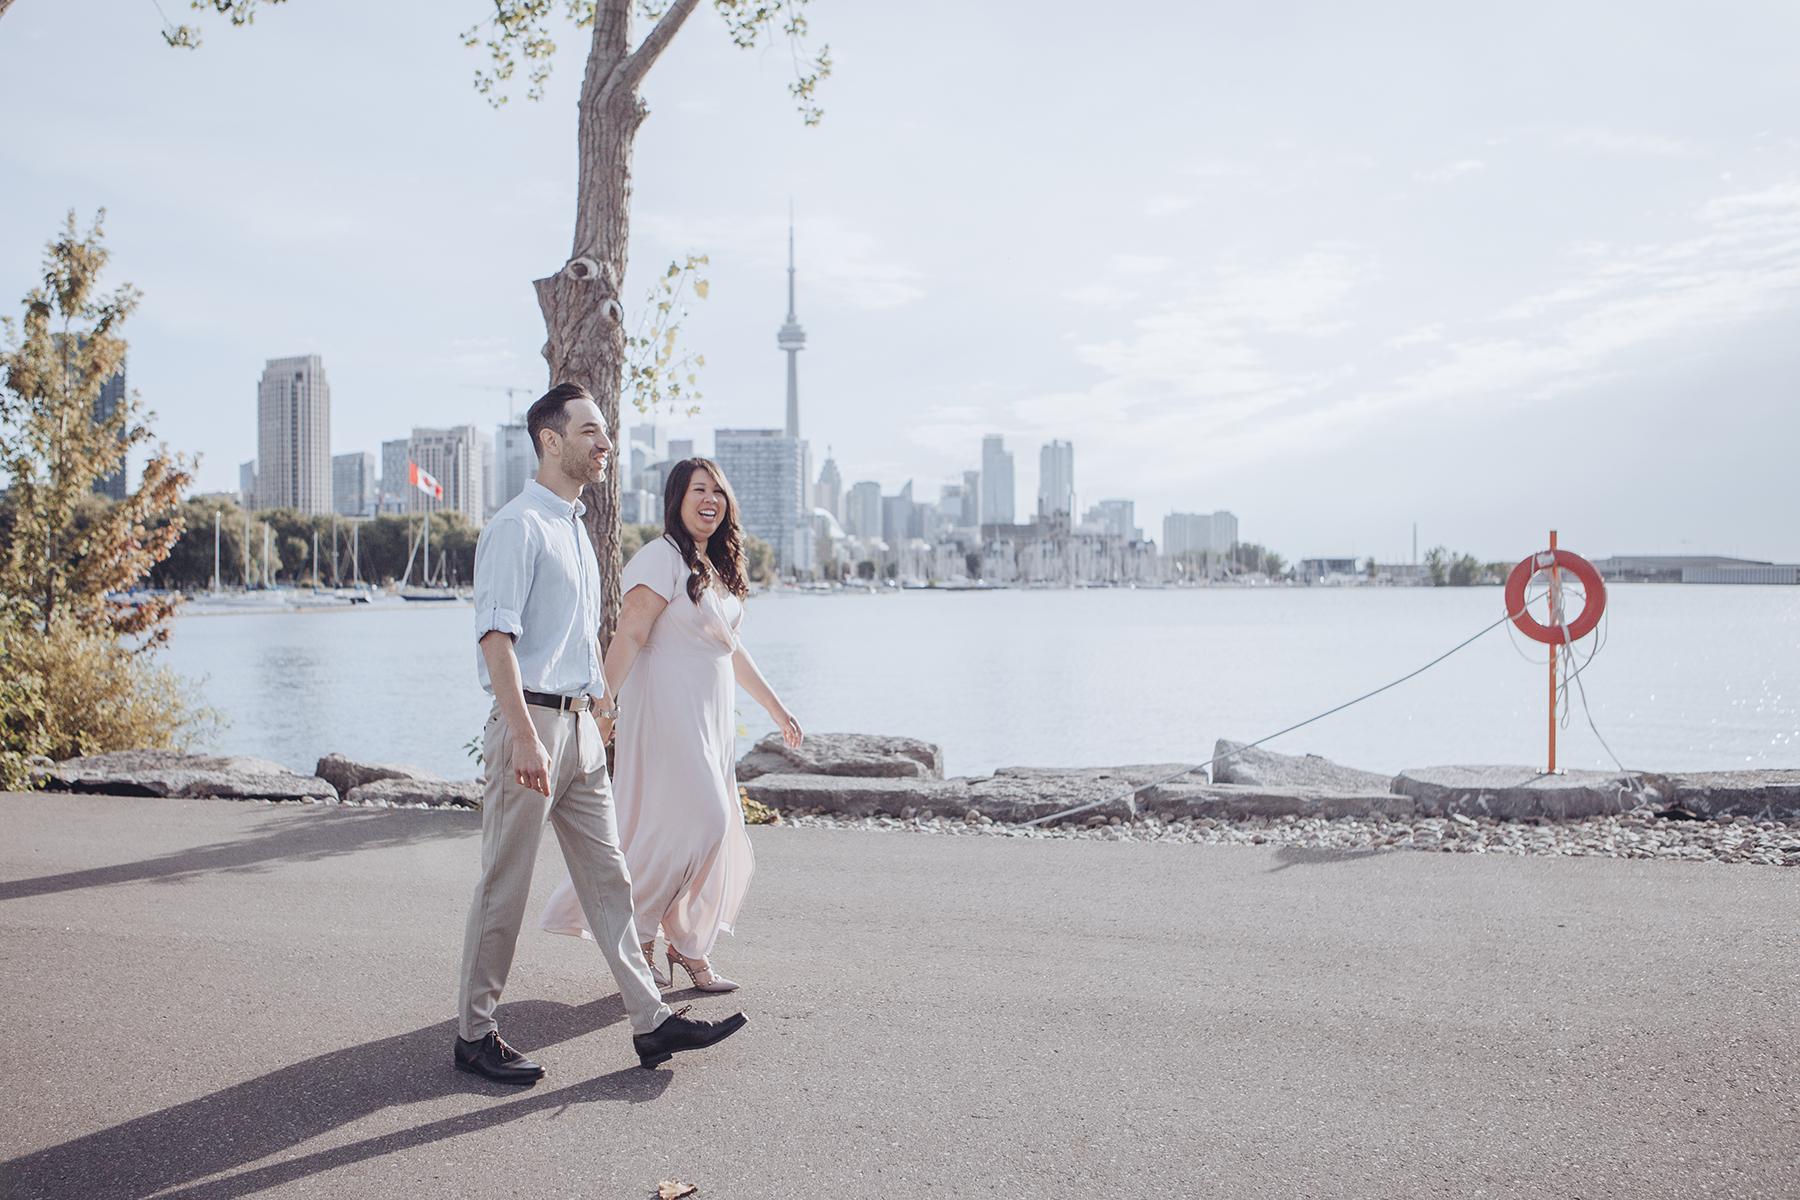 Trillium Park Engagement Session in Toronto Lisa Vigliotta Photography03